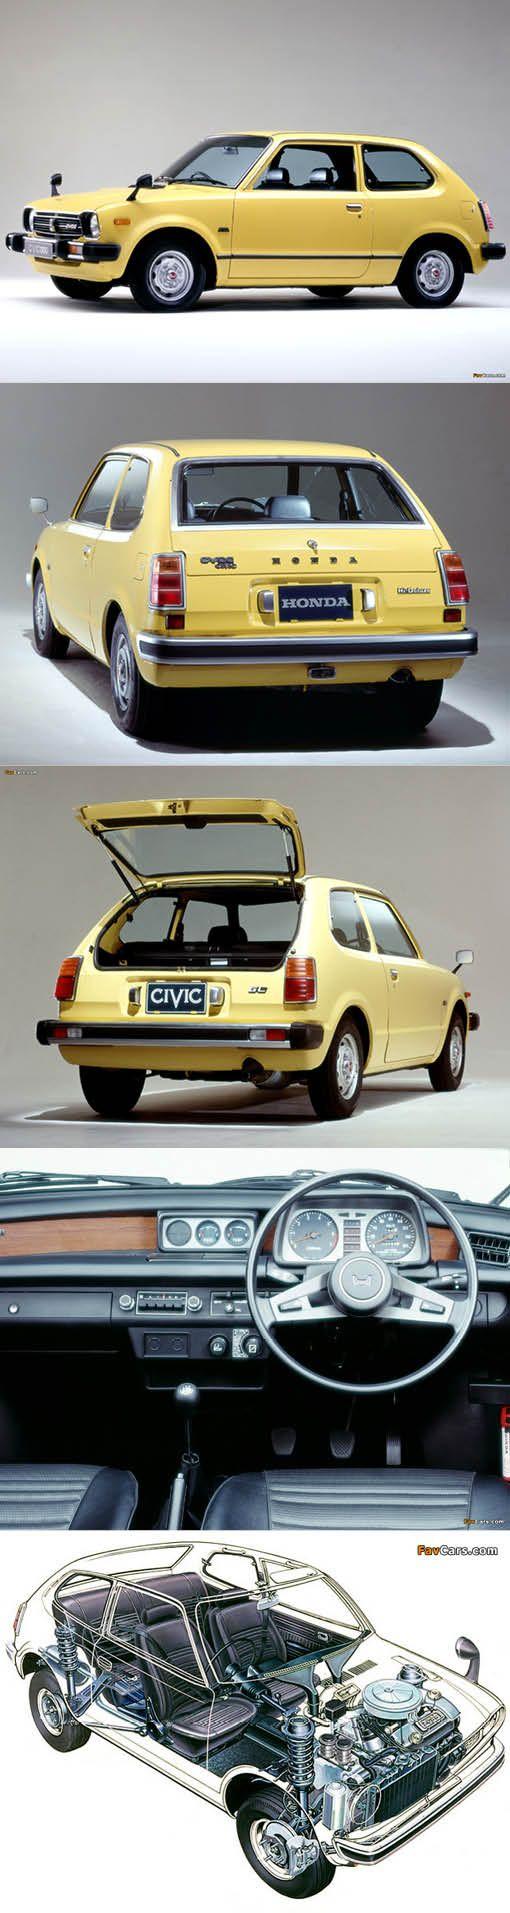 1972 Honda Civic / Japan / yellow